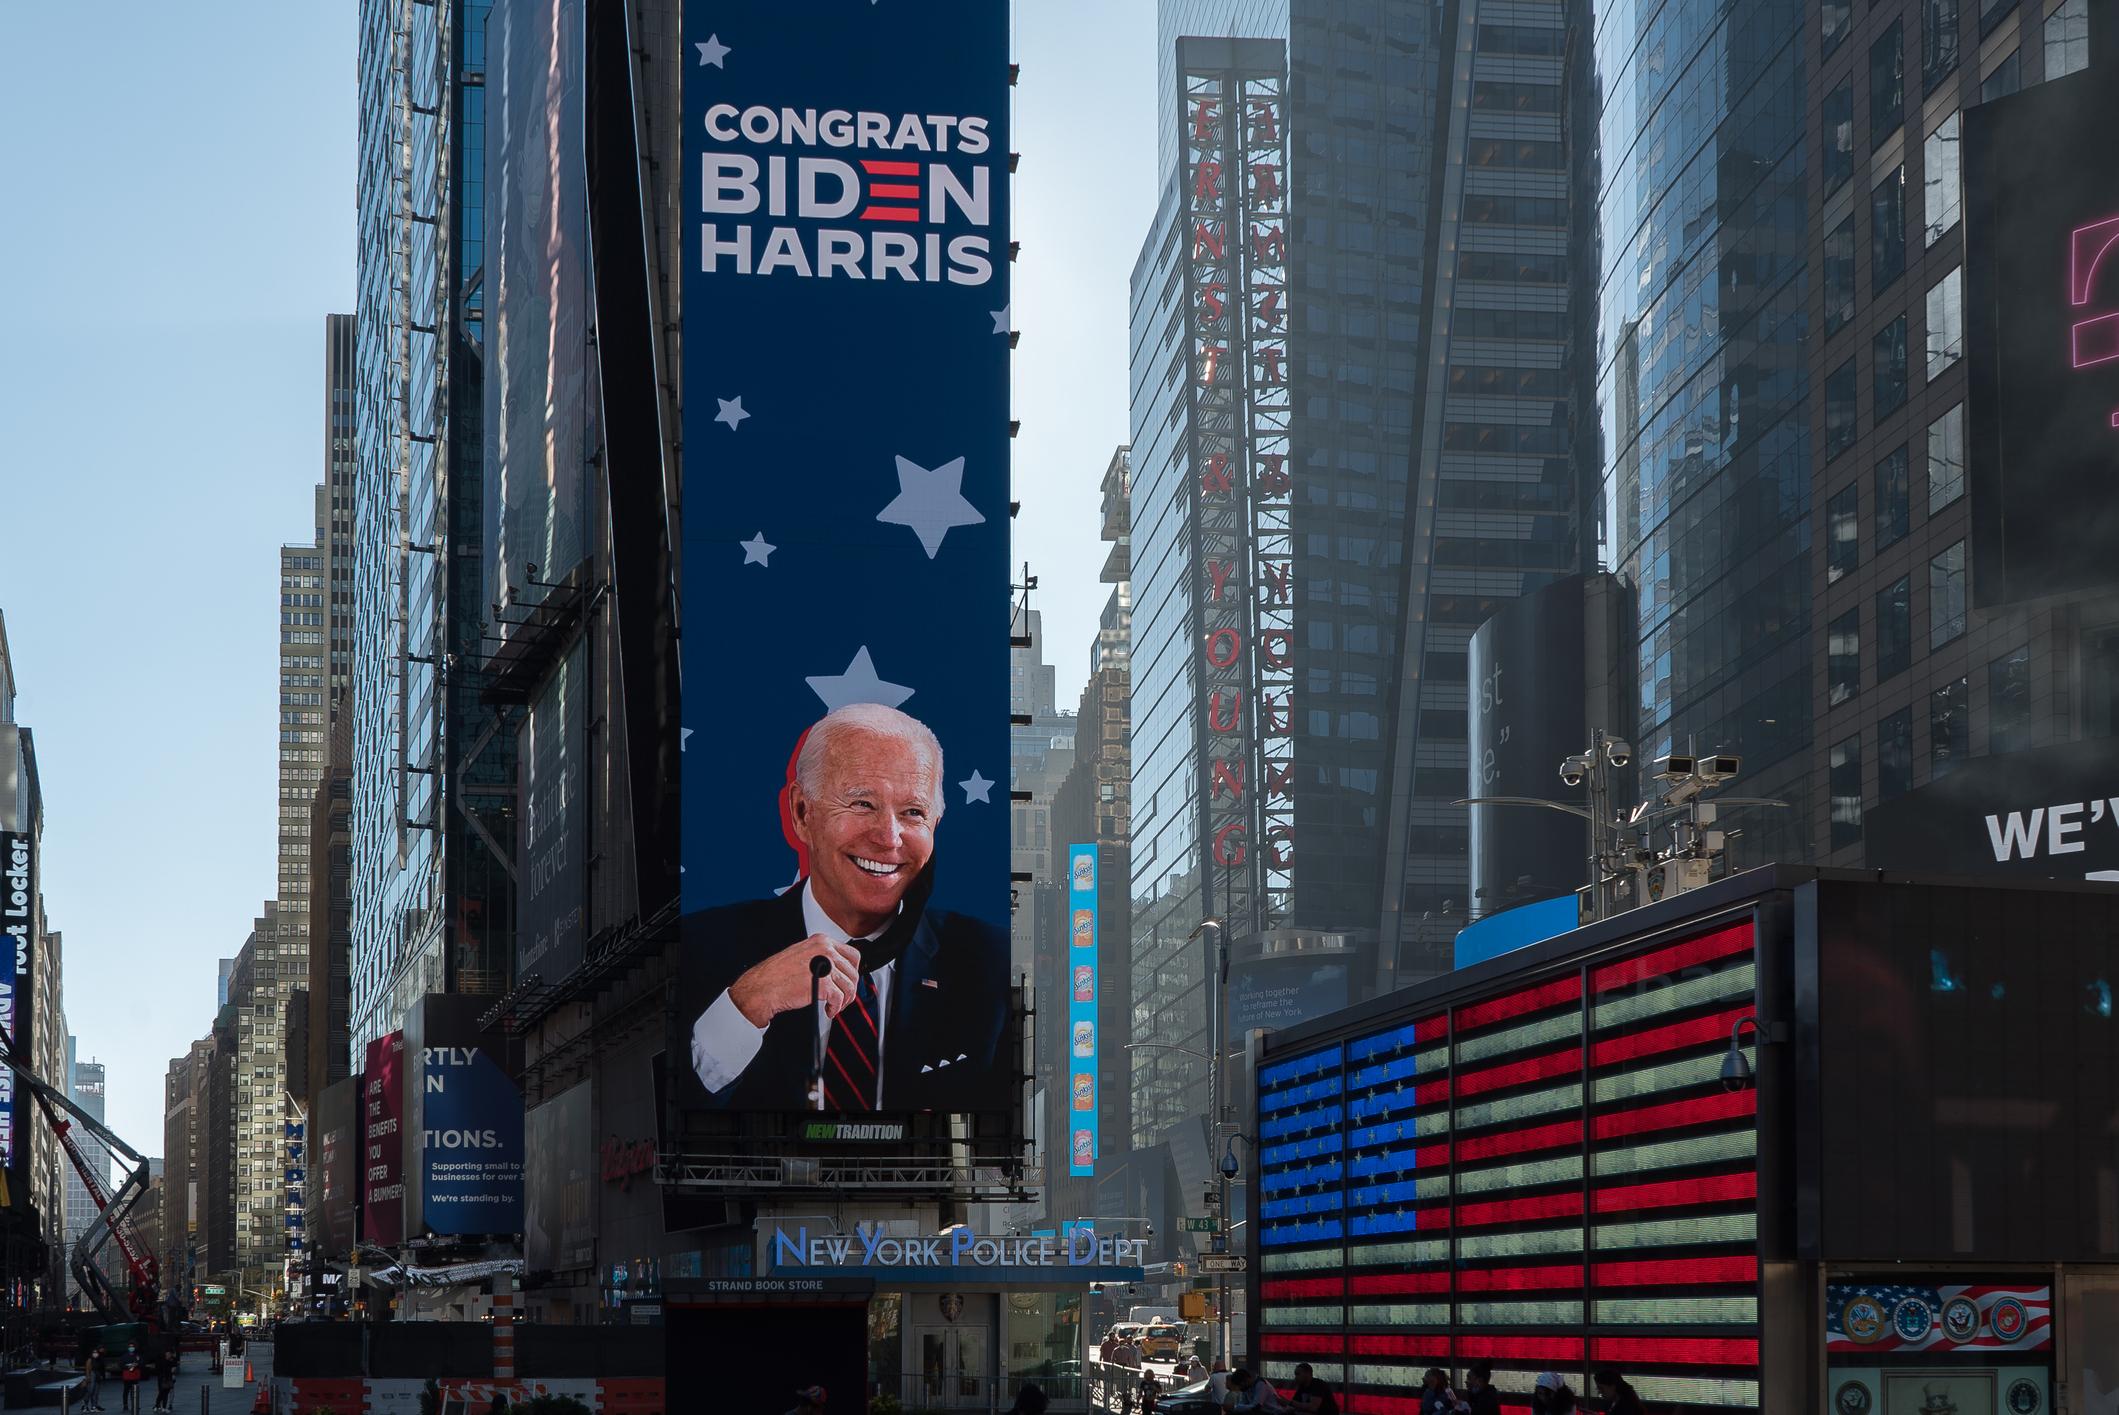 Times Square tribute to president elect Joe Biden. Image credit: iStock